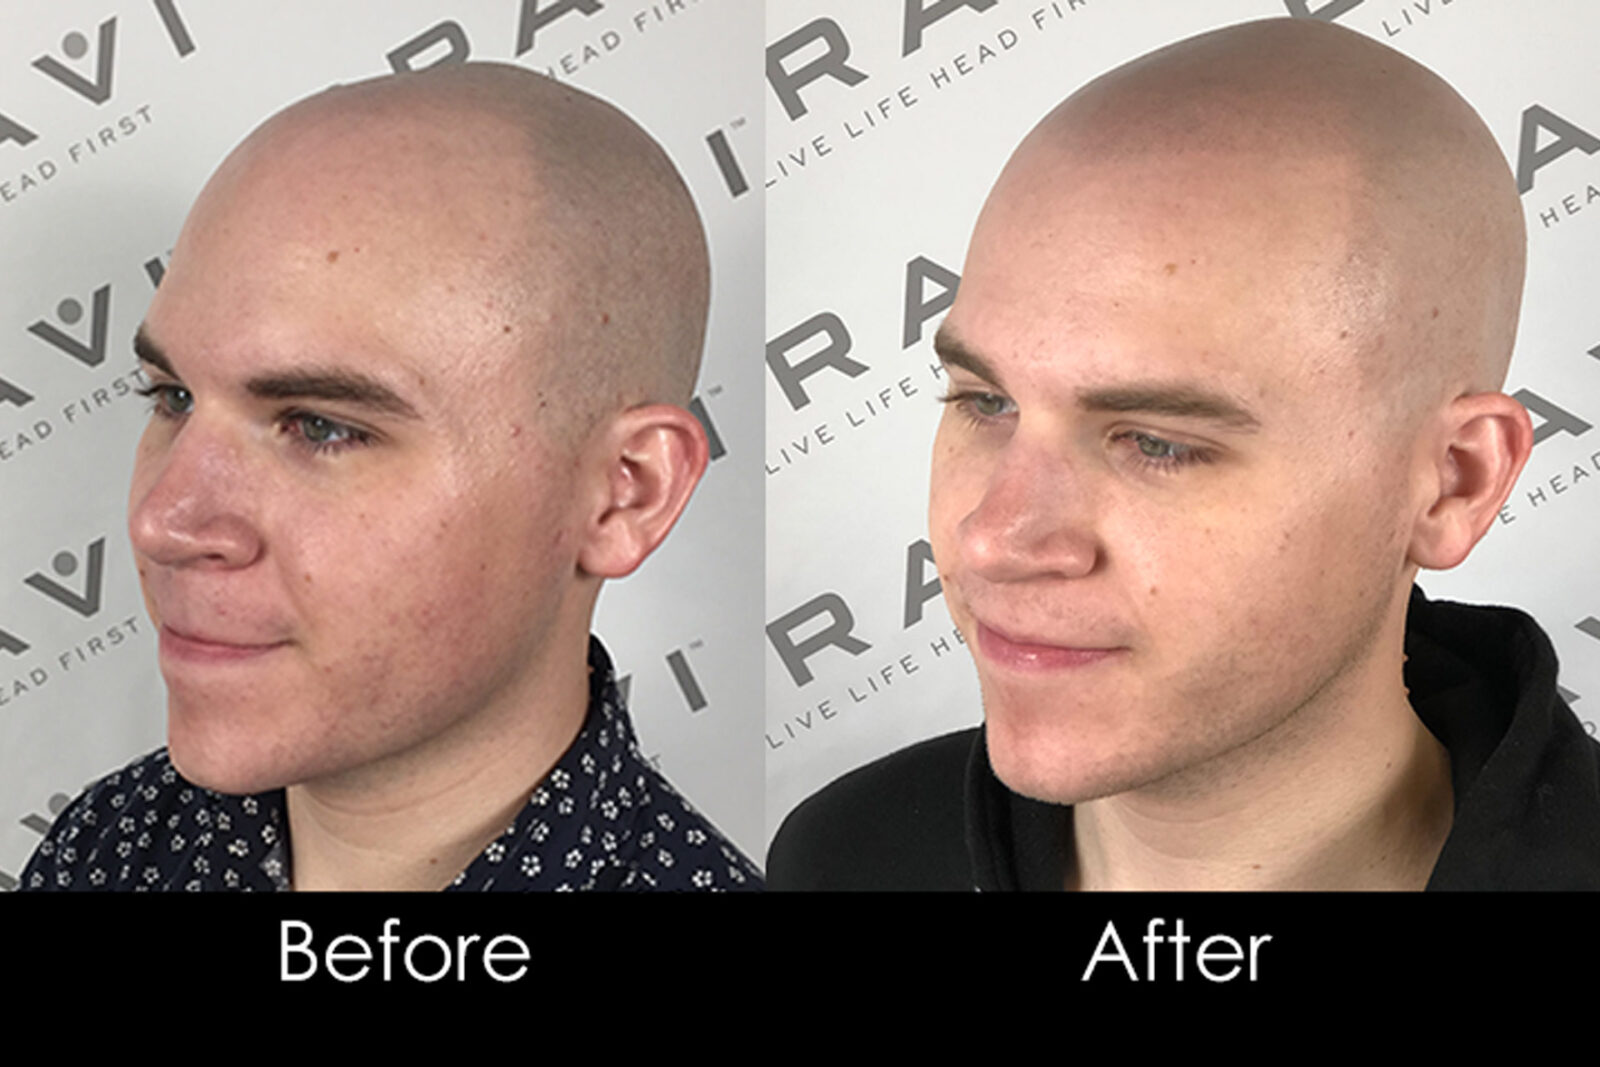 John's Hair Loss Journey With Scalp MicroPigmentation